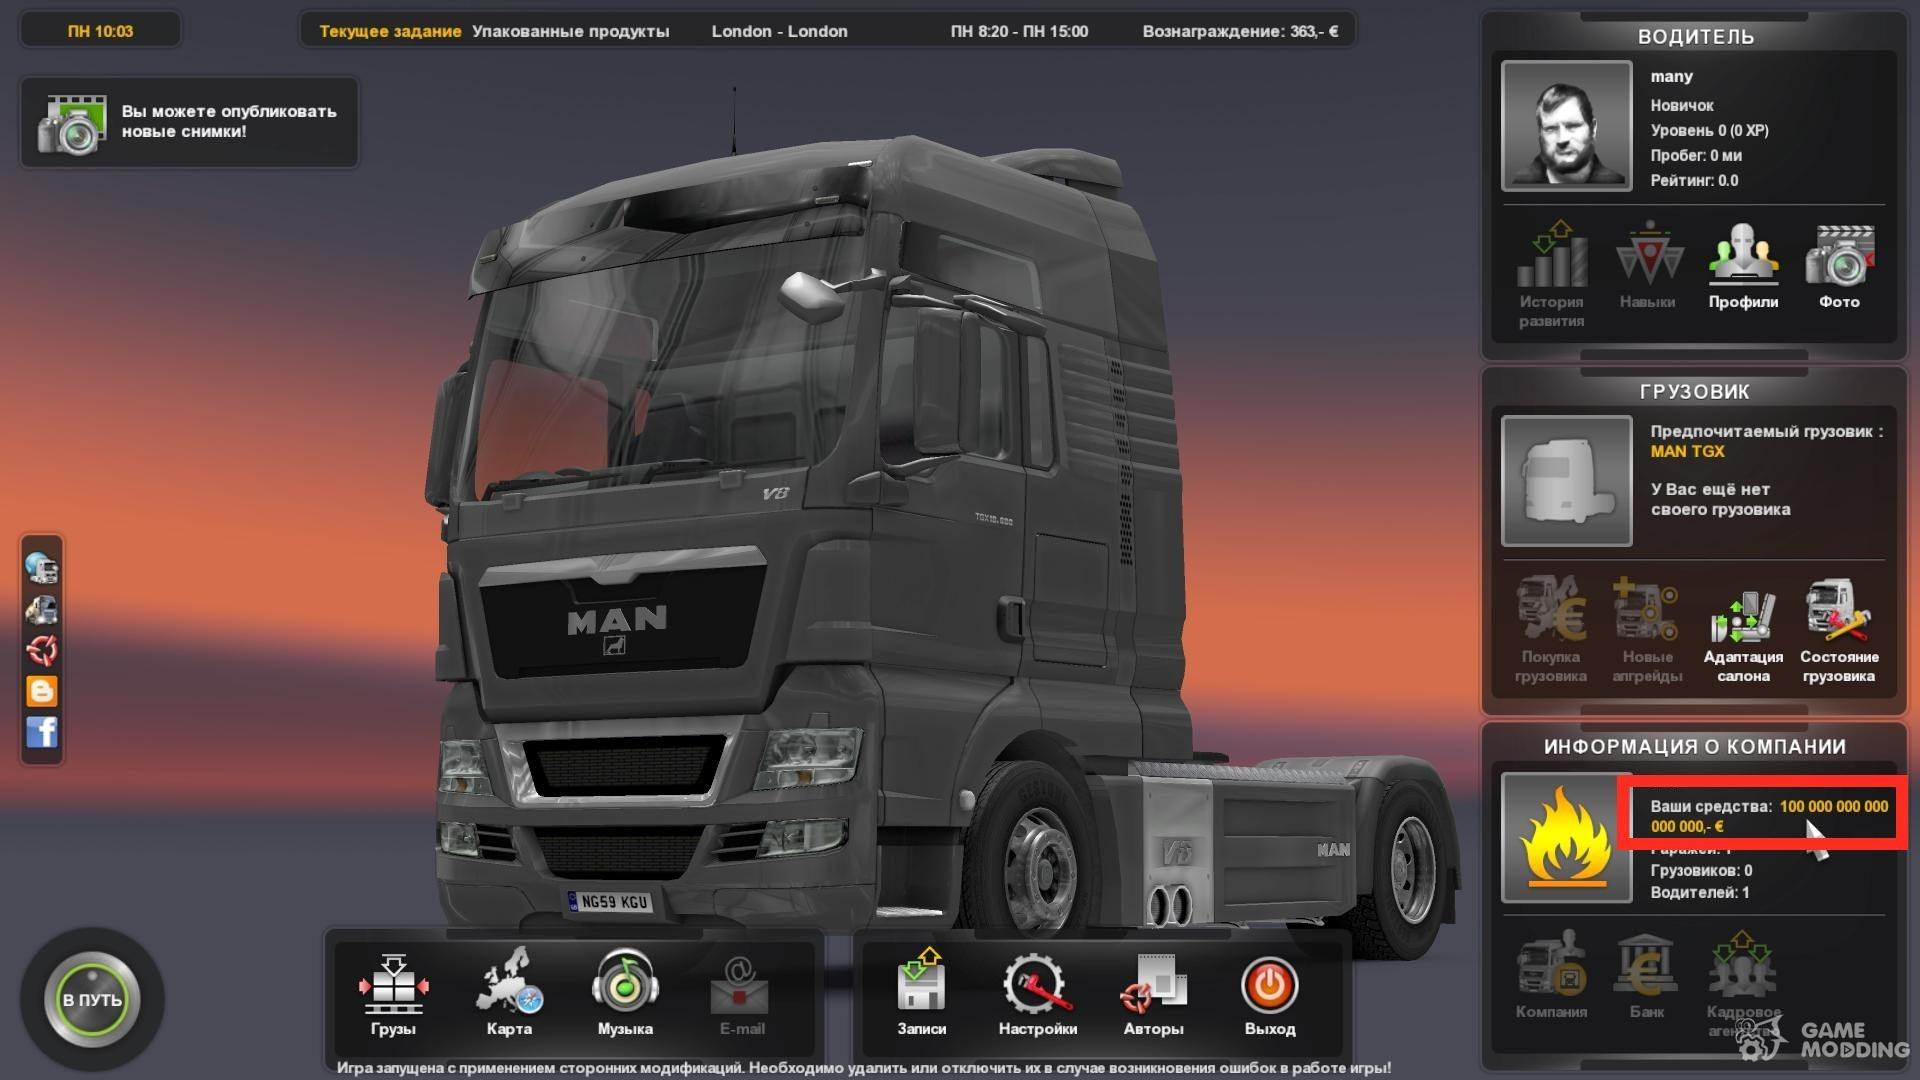 мод для игры euro truck simulator 2 много денег